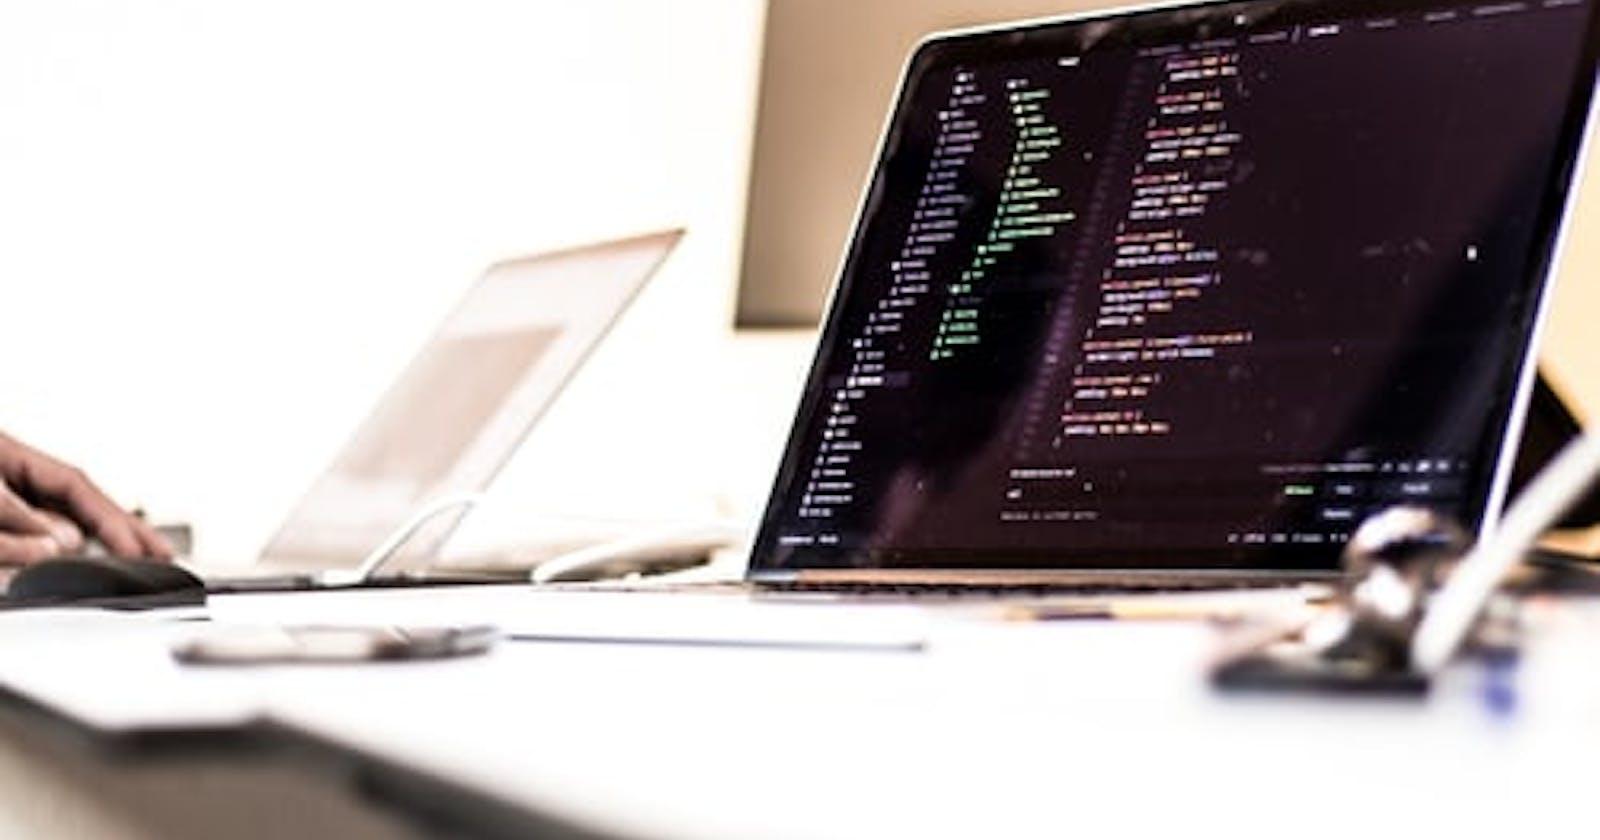 Deploying your Work in Web Development